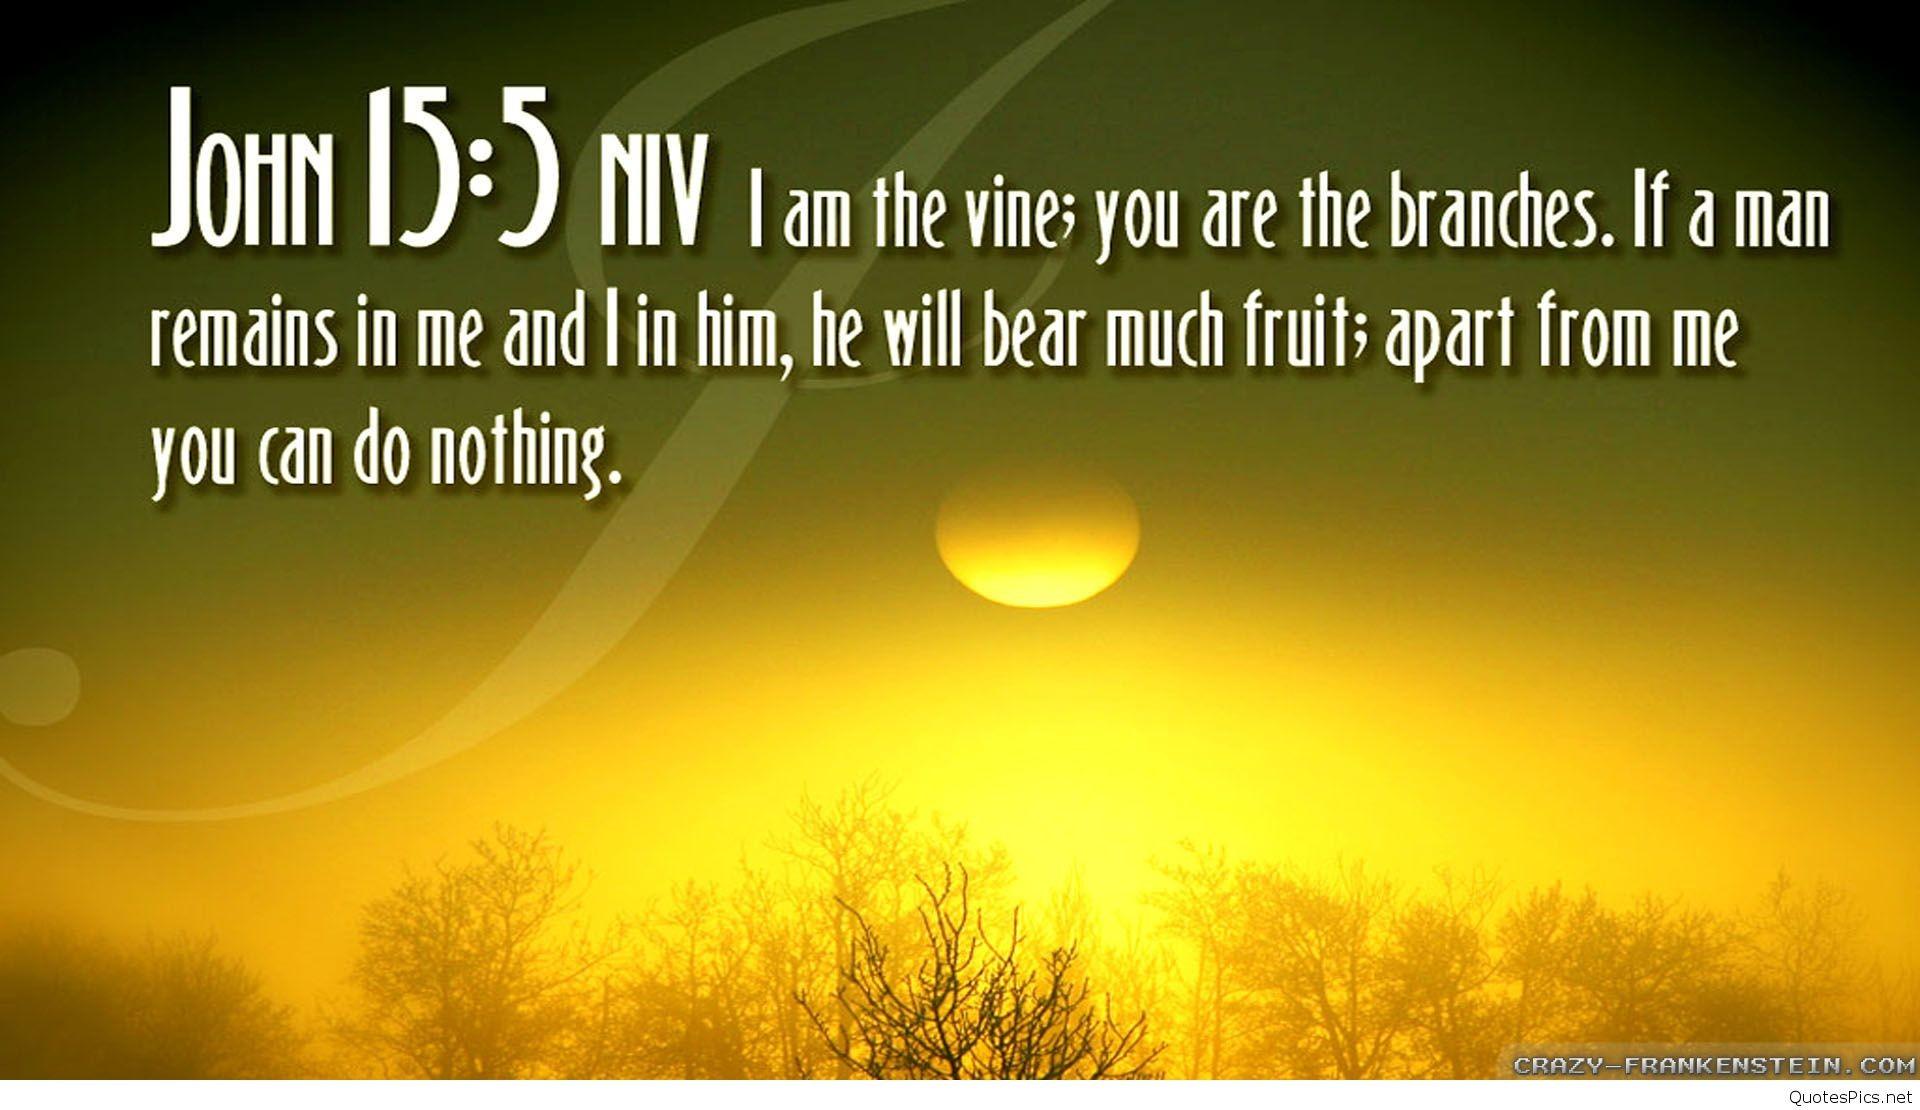 Religious-Quote-Wallpaper-Widescreen-. tumblr_mcvs50XE161r6dxlpo1_500.  S34UR1OqaKSAQSnBAAEi1QNRhkk72